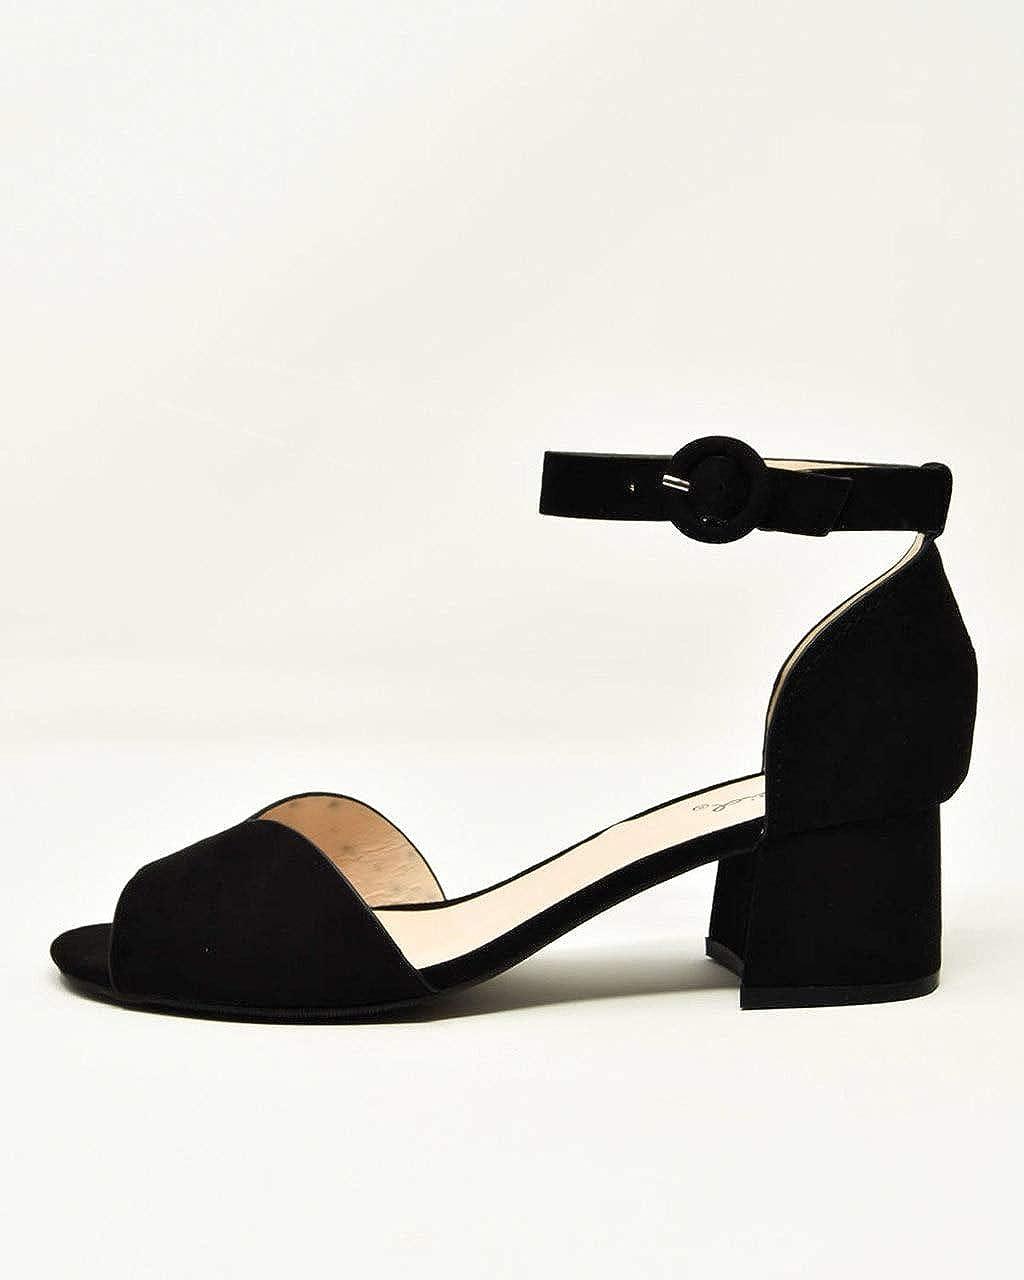 Qupid Katz-58 Womens Suede PU Peep Toe Block Heel Sandals